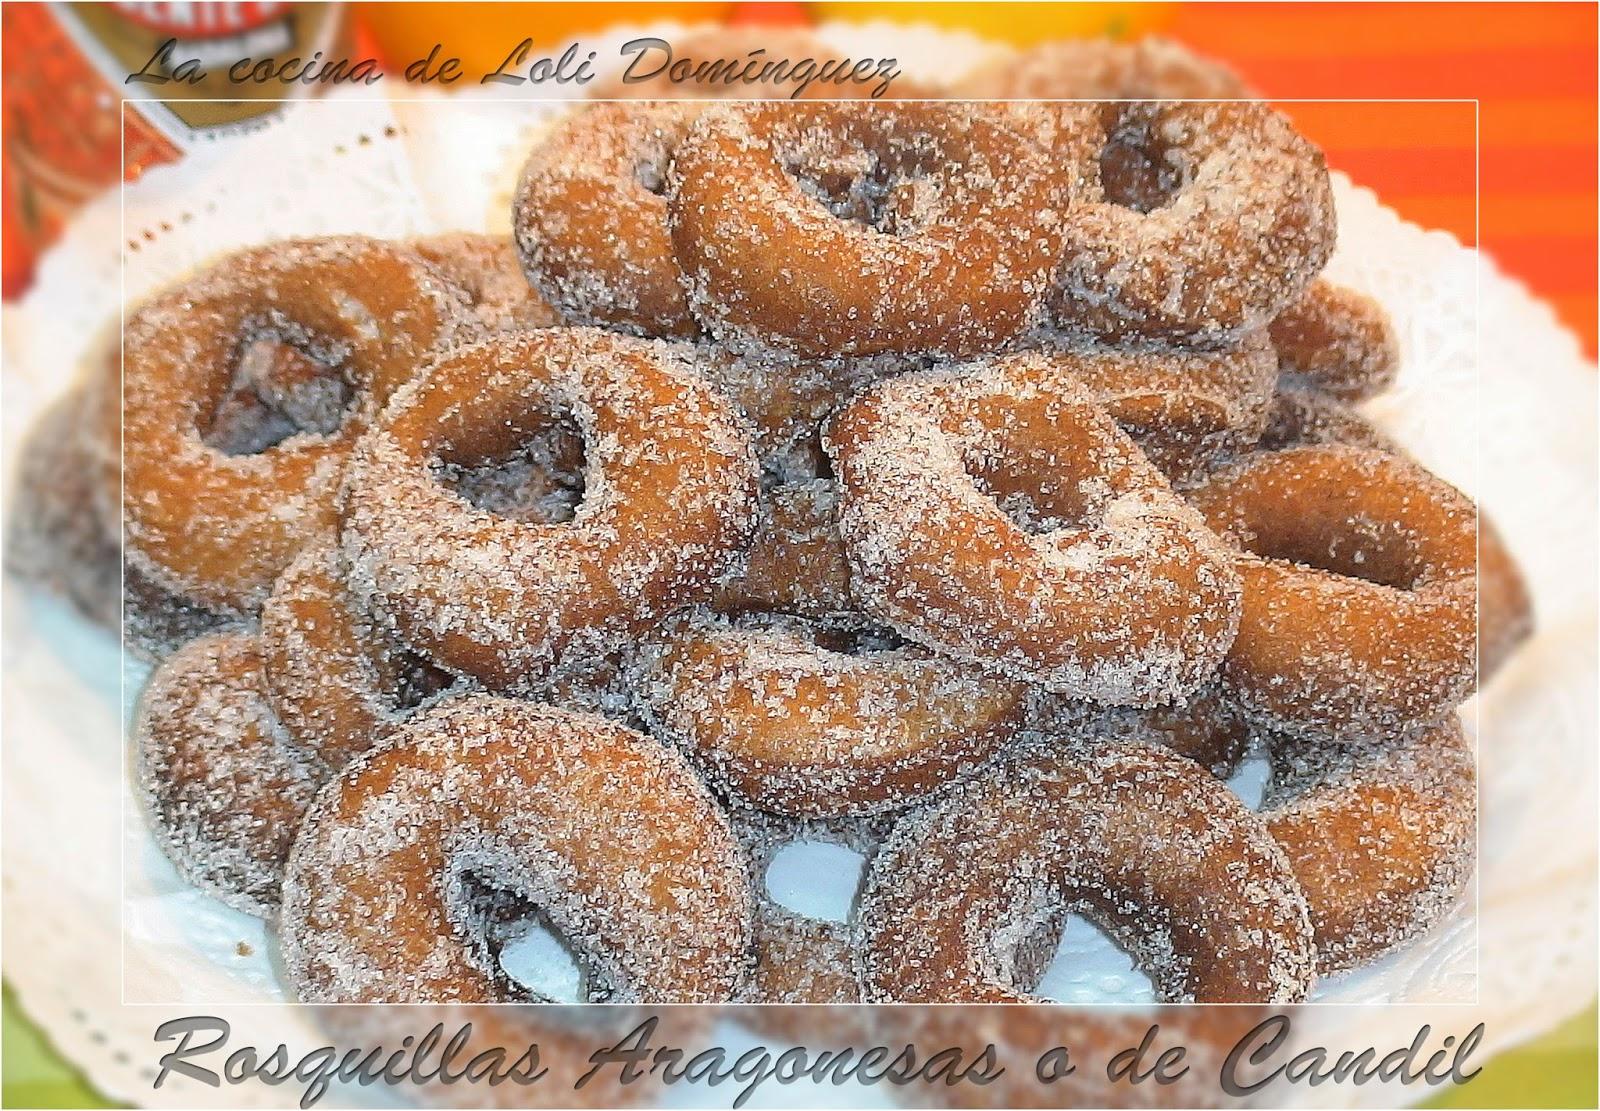 la cocina de loli dom nguez rosquillas aragonesas o de candil